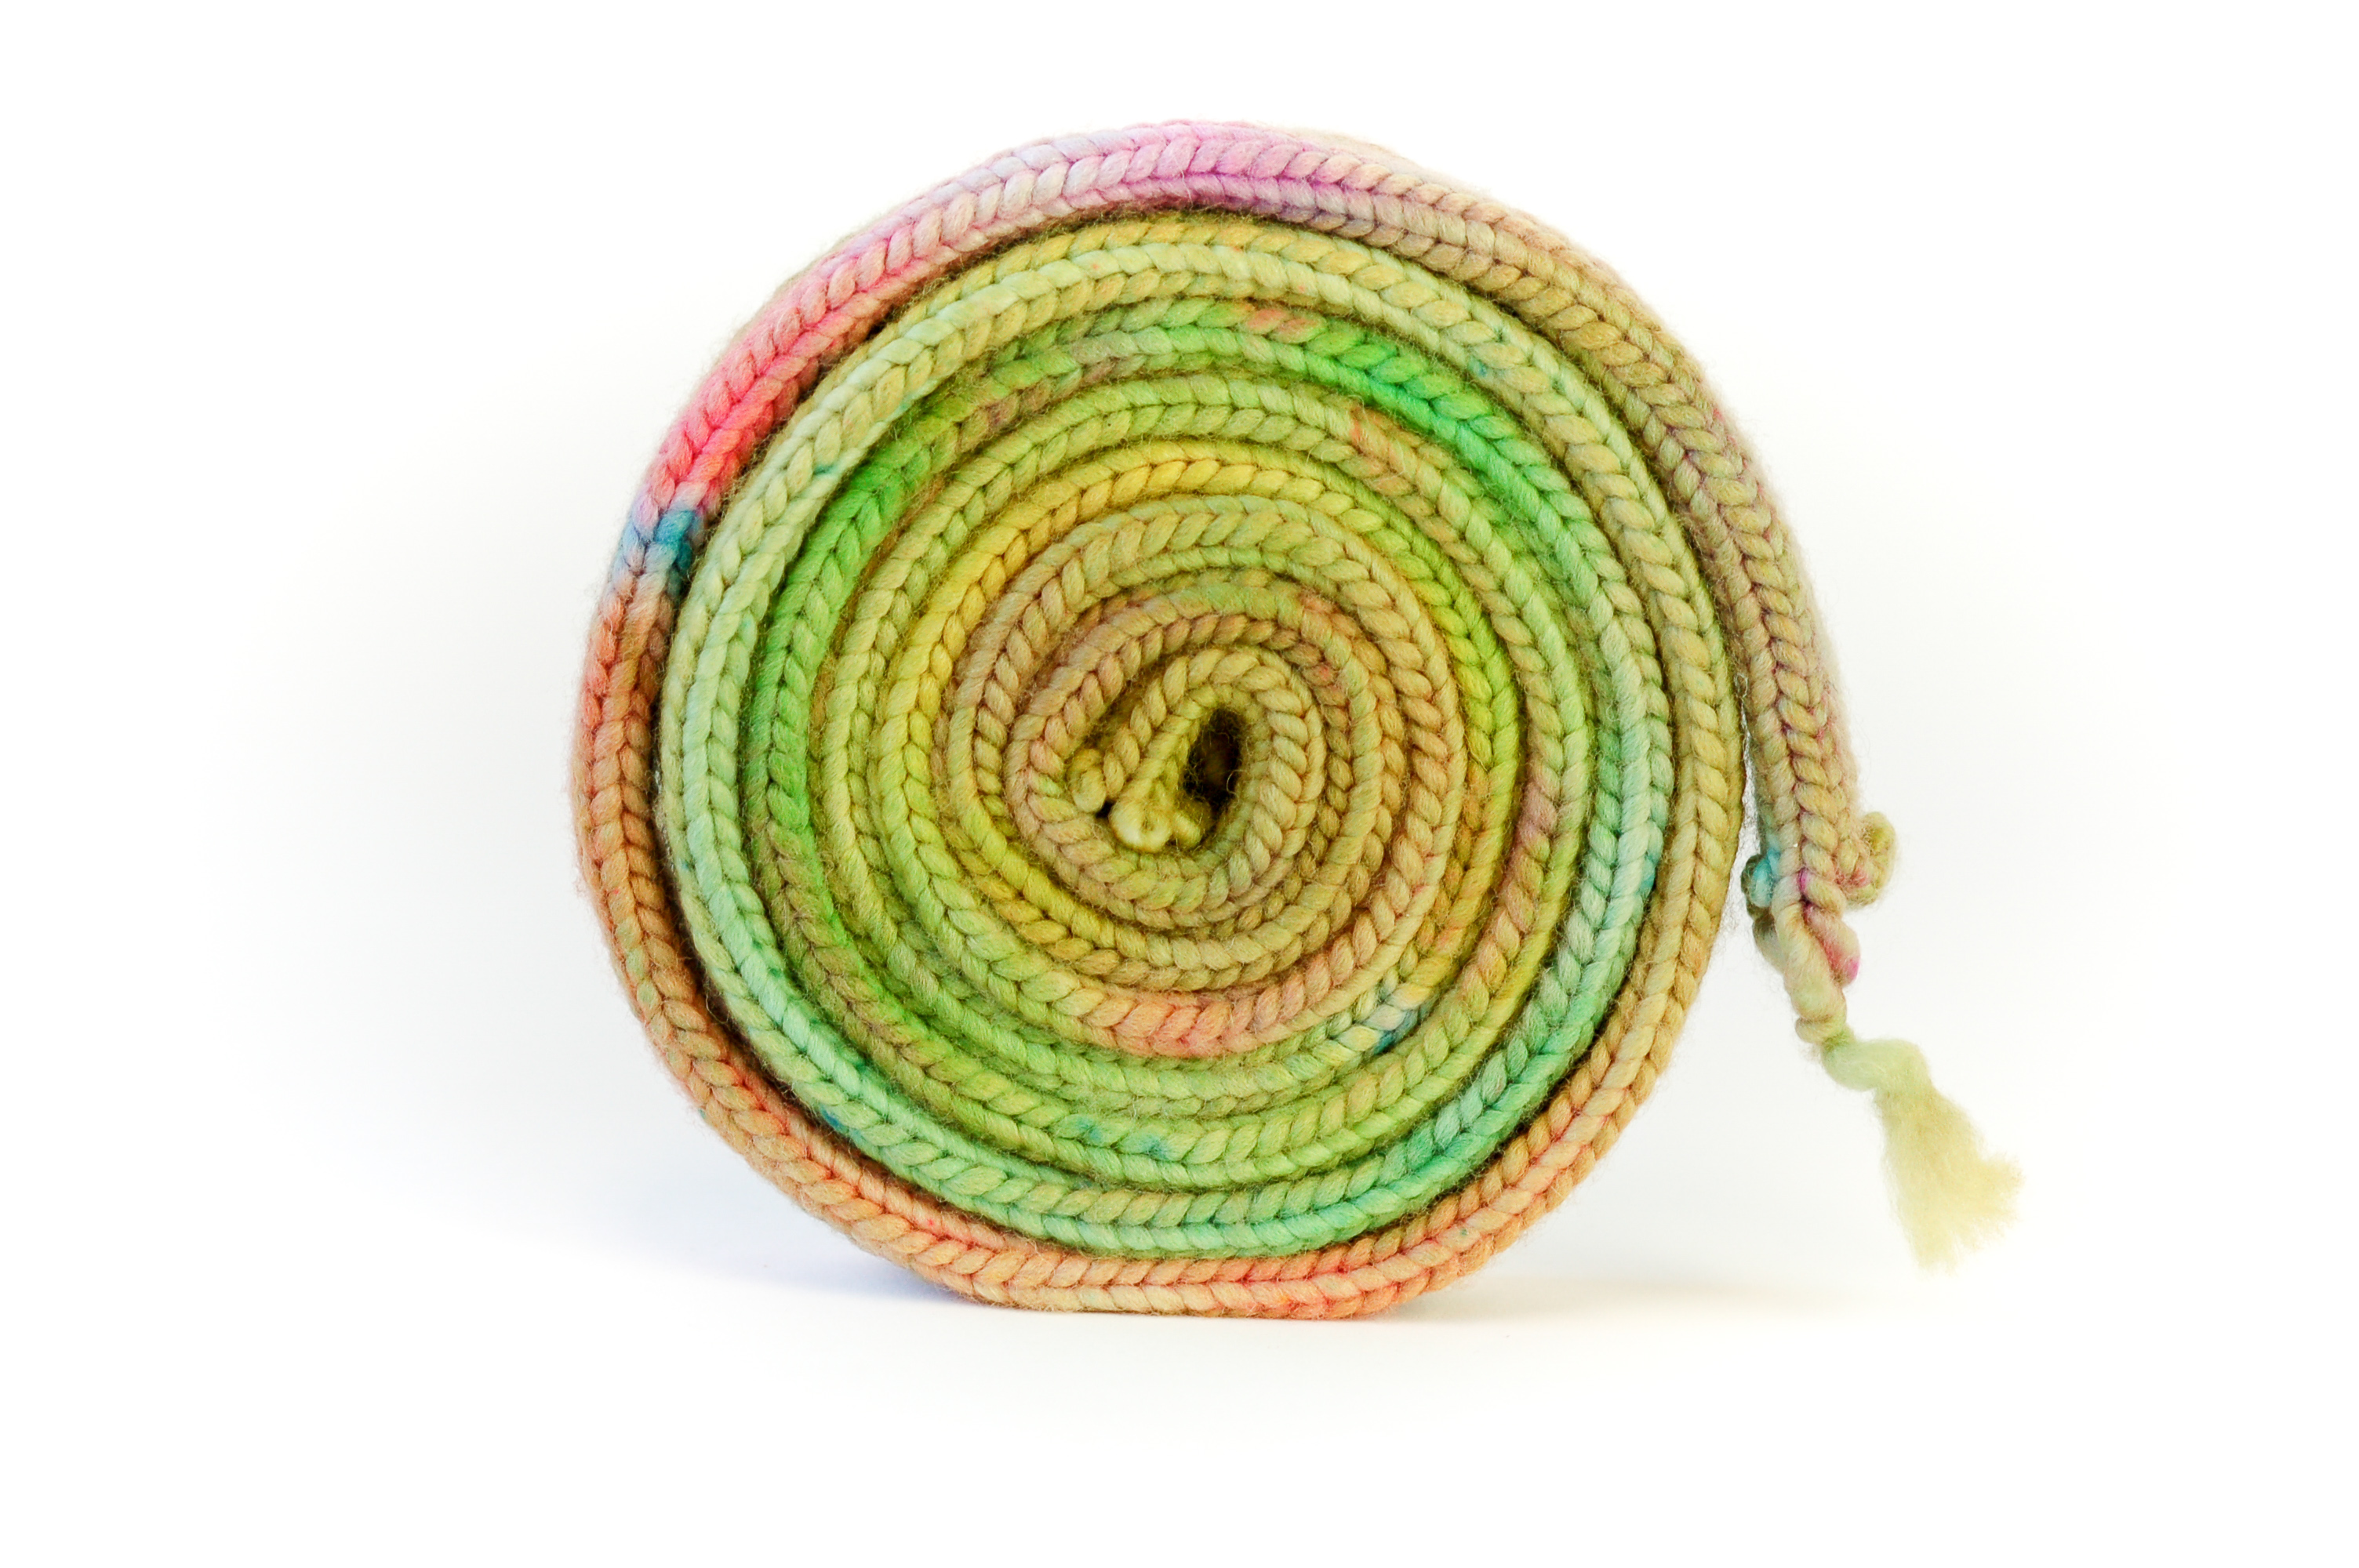 https://www.makersmercantile.com/shop/Yarn/Kinky-Yarn/p/Kinky-Yarn-Dyeing-Technique-Easter-Egg-Dye-Tablets-x40083340.htm